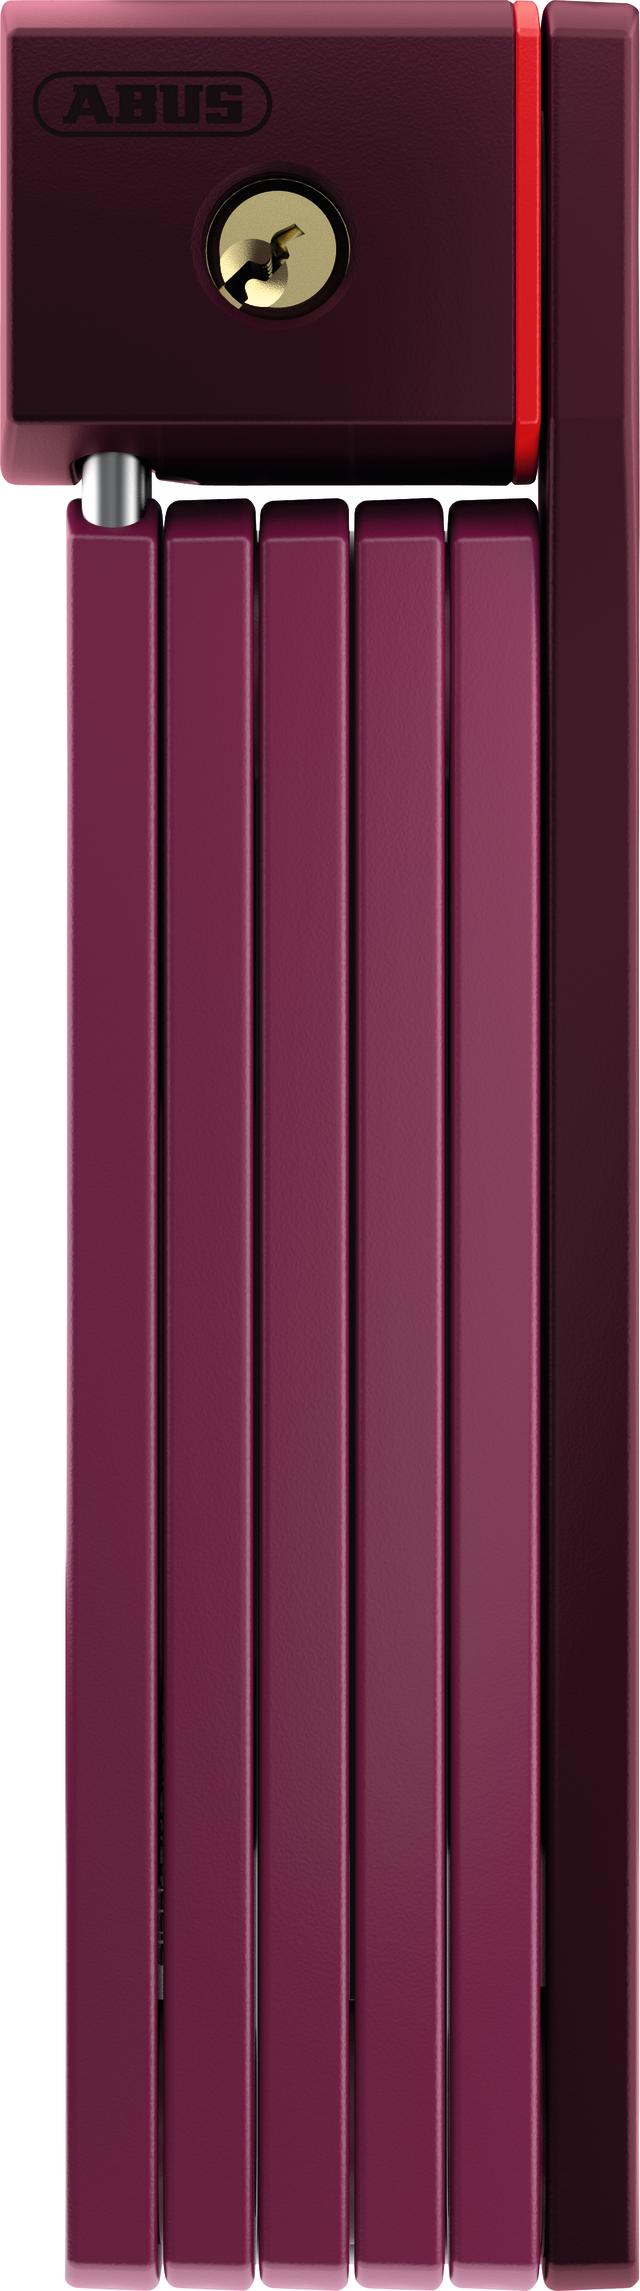 Faltschloss 5700/80 core purple SH